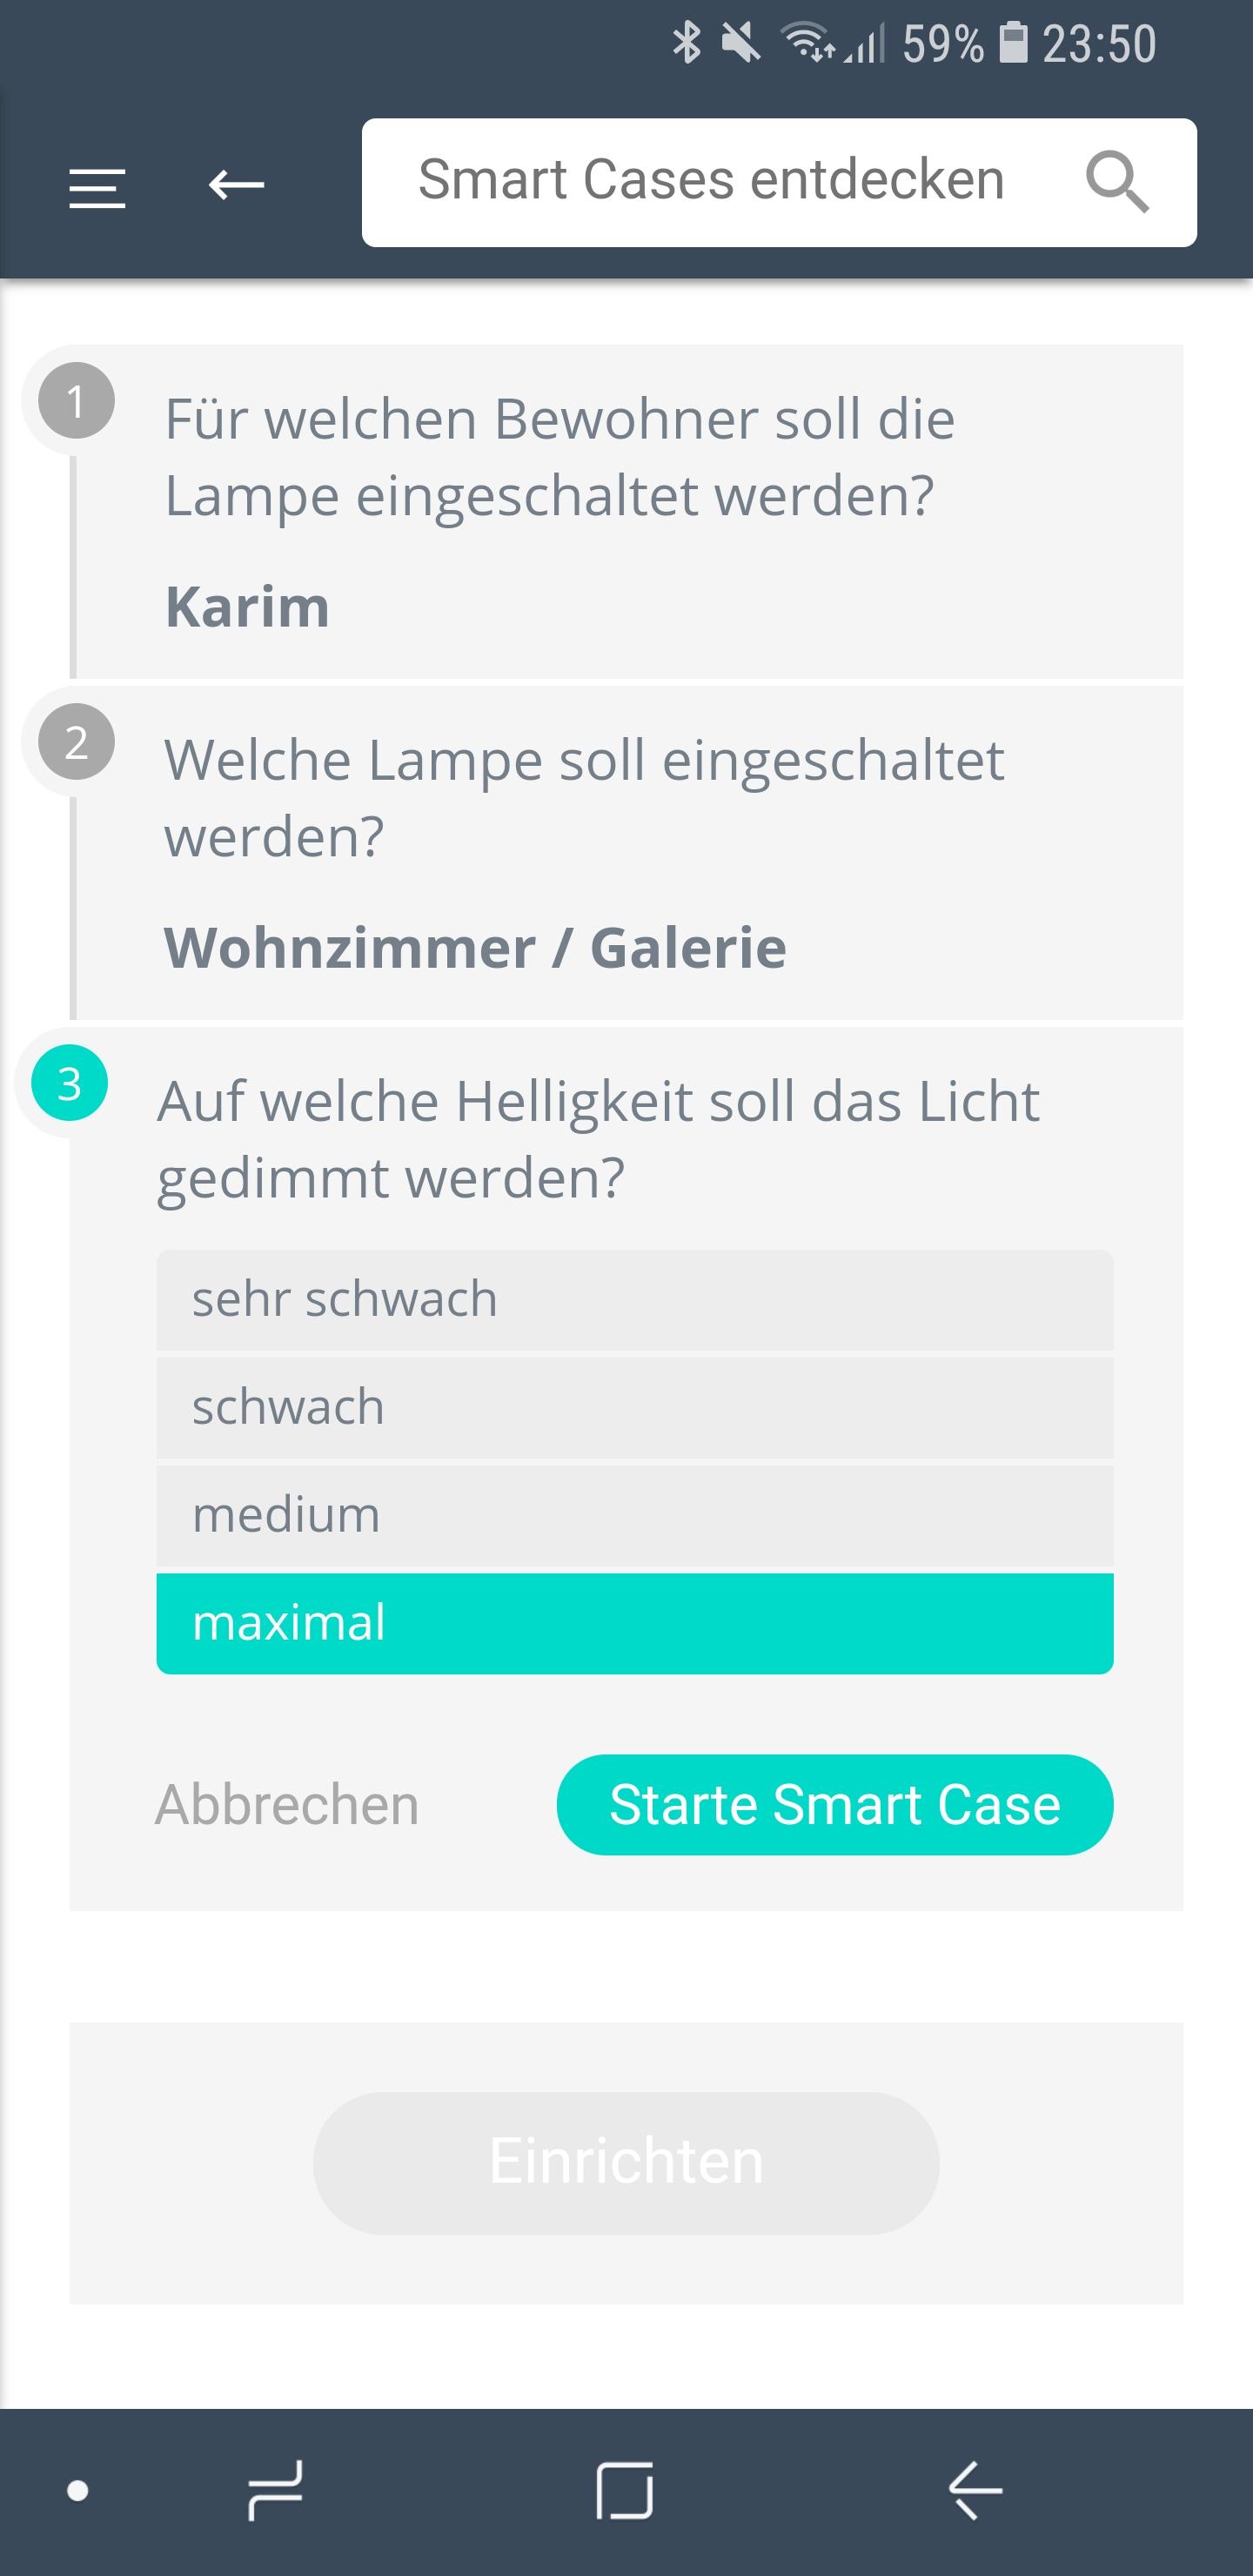 naon Bogen App Smartcase hinzufügen 06